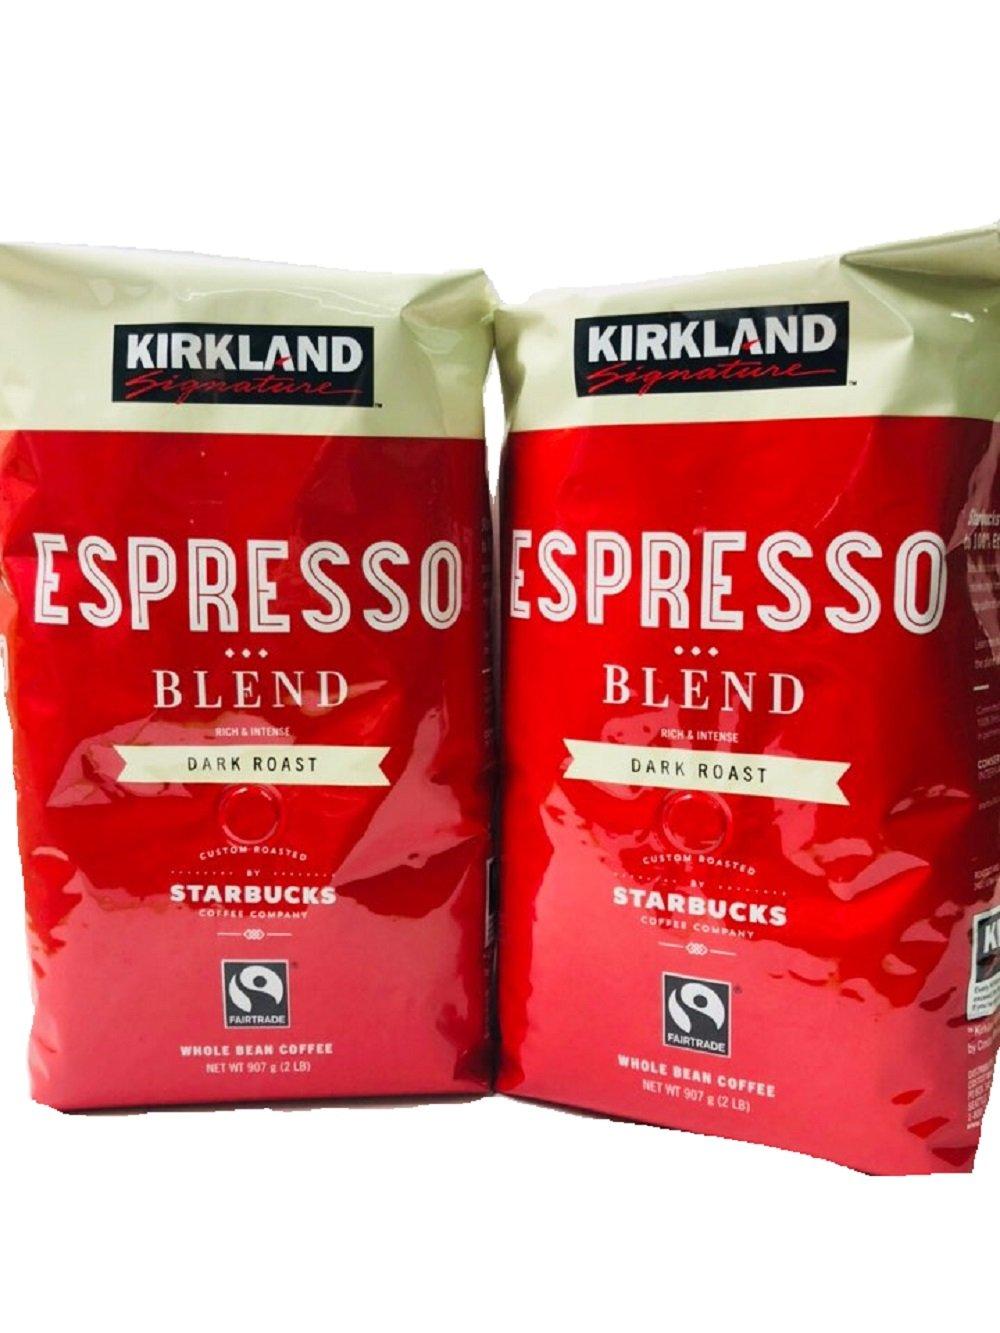 (Pack of 2) Kirkland Signature Dark Roast ESPRESSO BLEND Coffee Roasted By Starbucks 32 Oz. Bag by Kirkland Signature